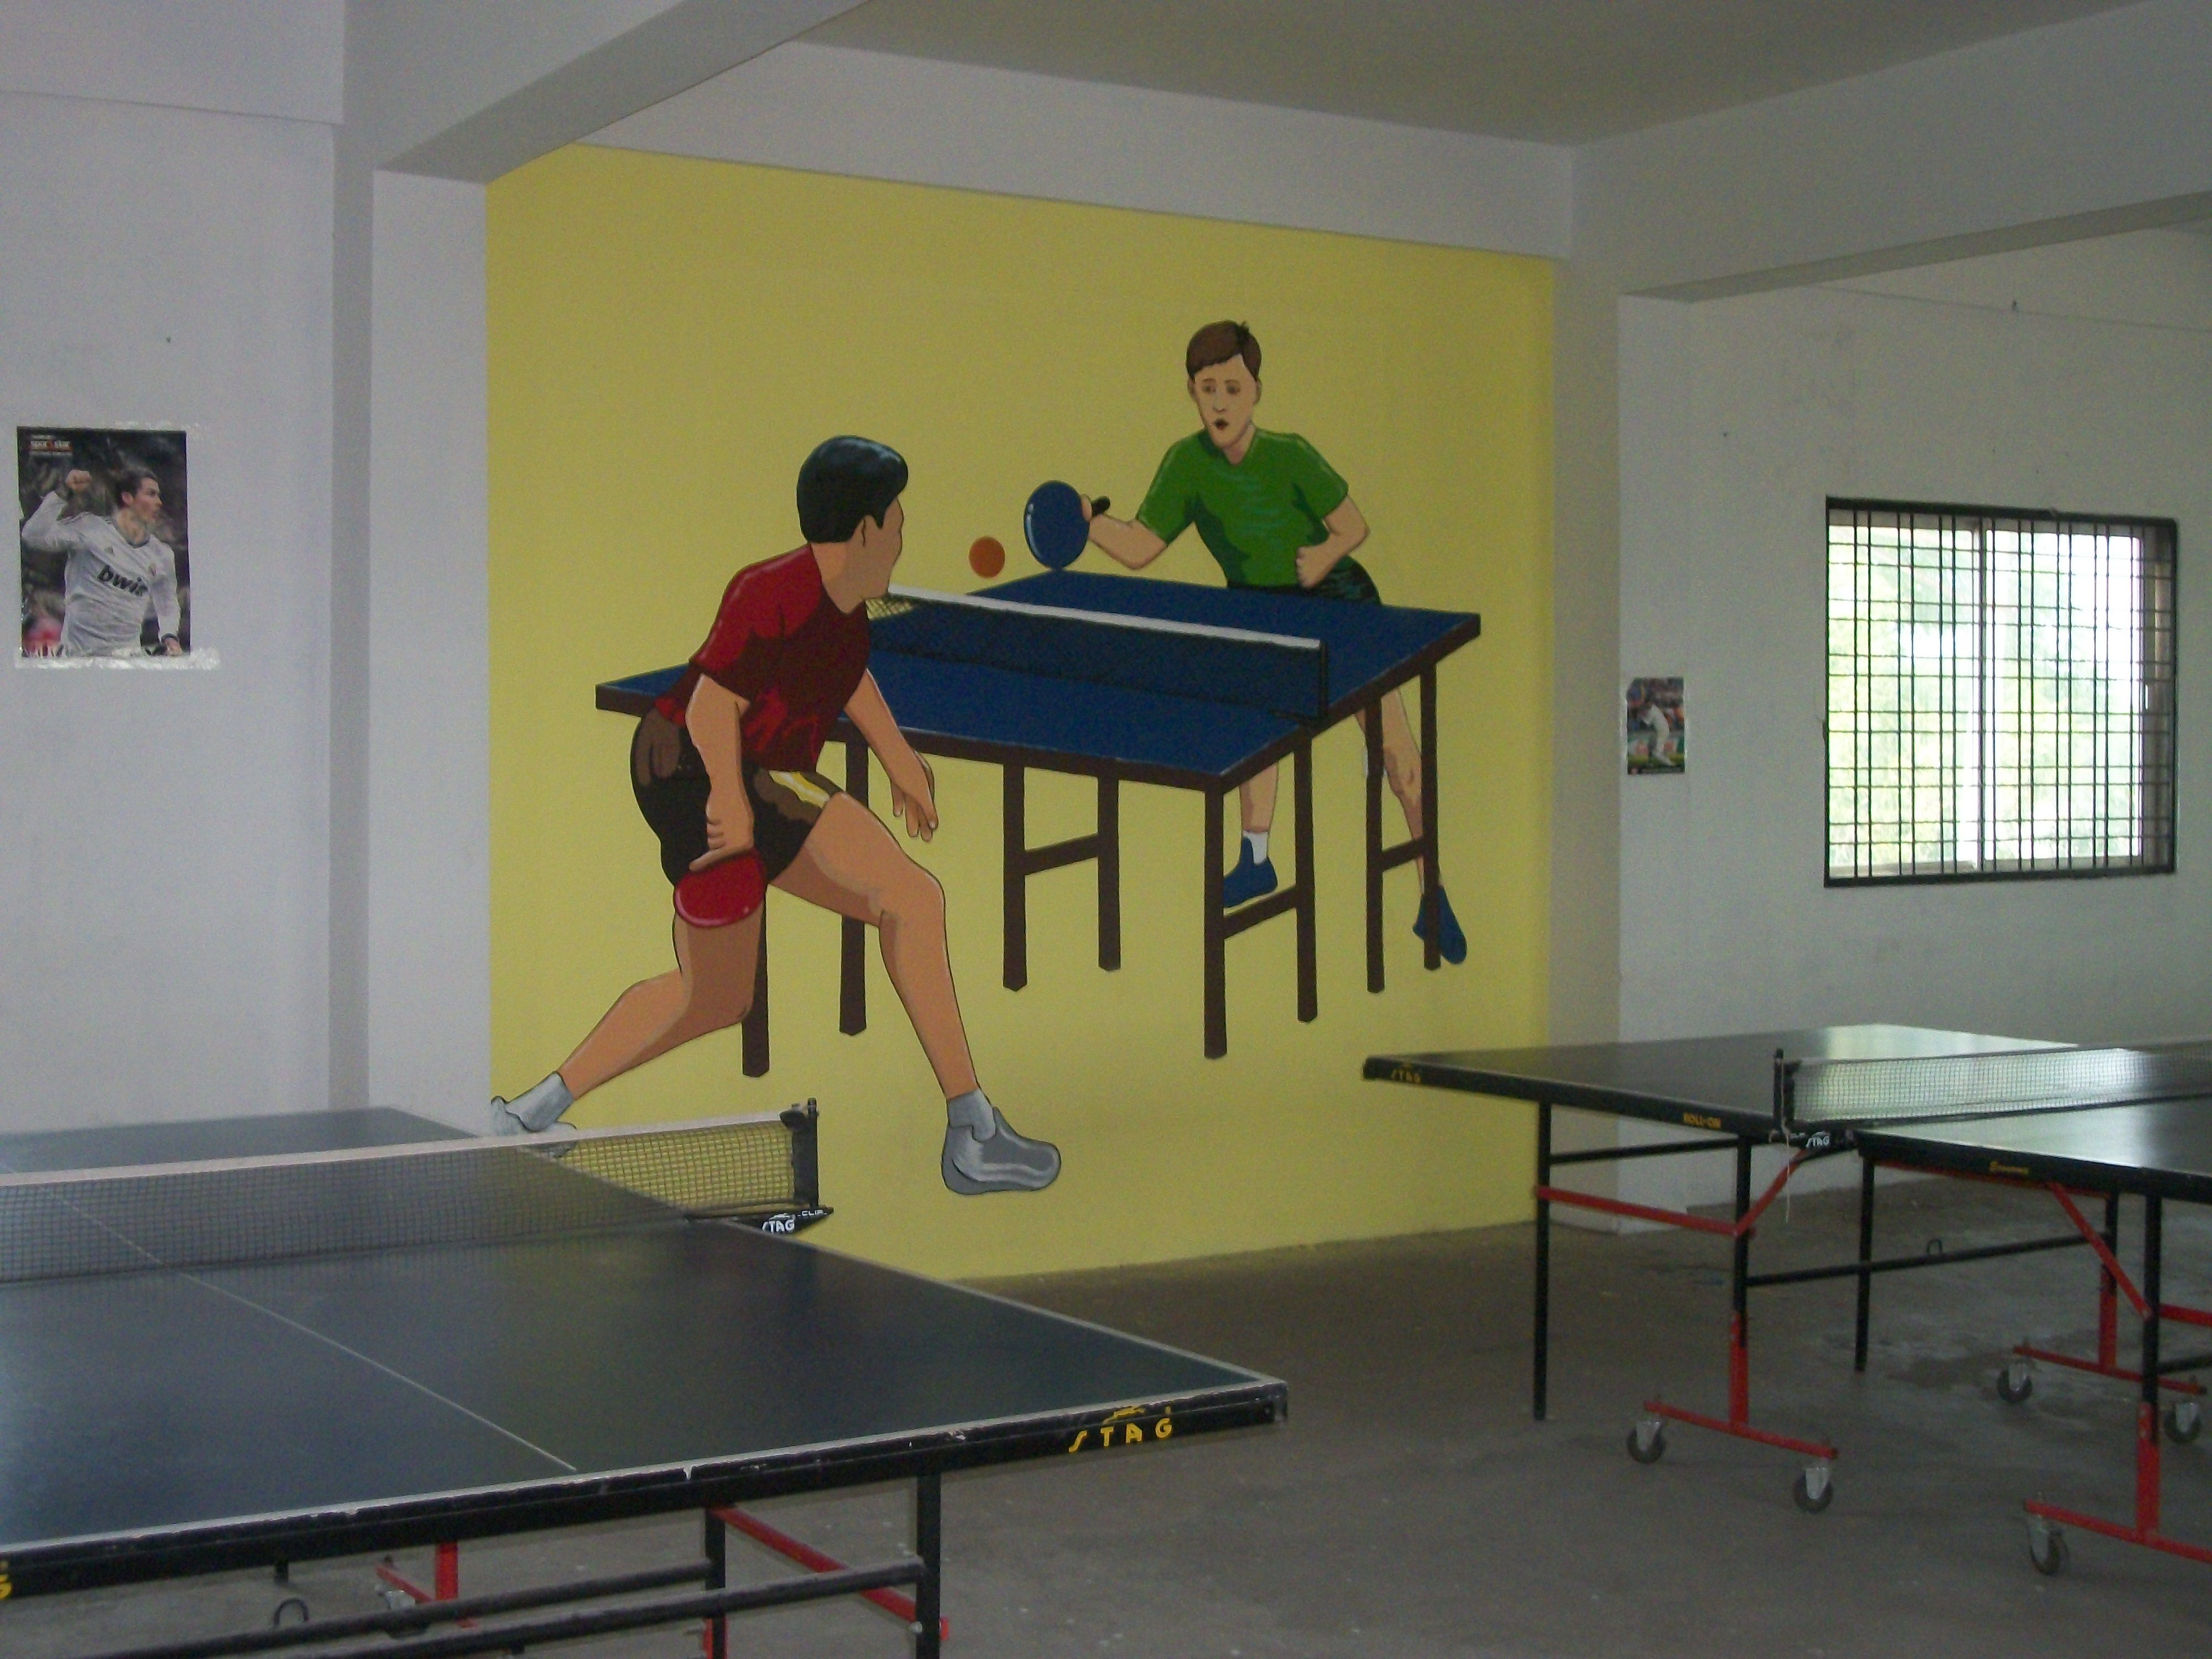 Boys Play Room Wall Painting Room Wall Painting Gym Wall Decor Sports Wall Decor